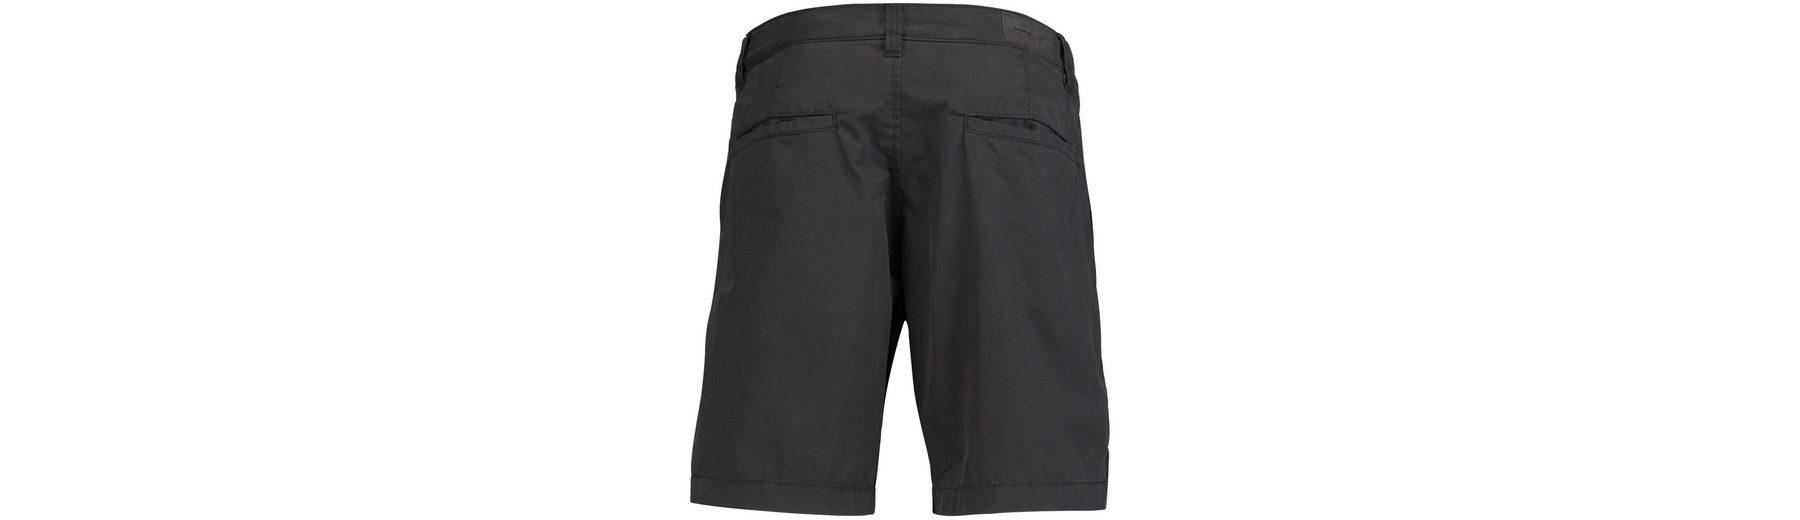 Mit Mastercard Günstigem Preis Offizieller Günstiger Preis O'Neill Walkshorts Sundays shorts iiwqEHa5